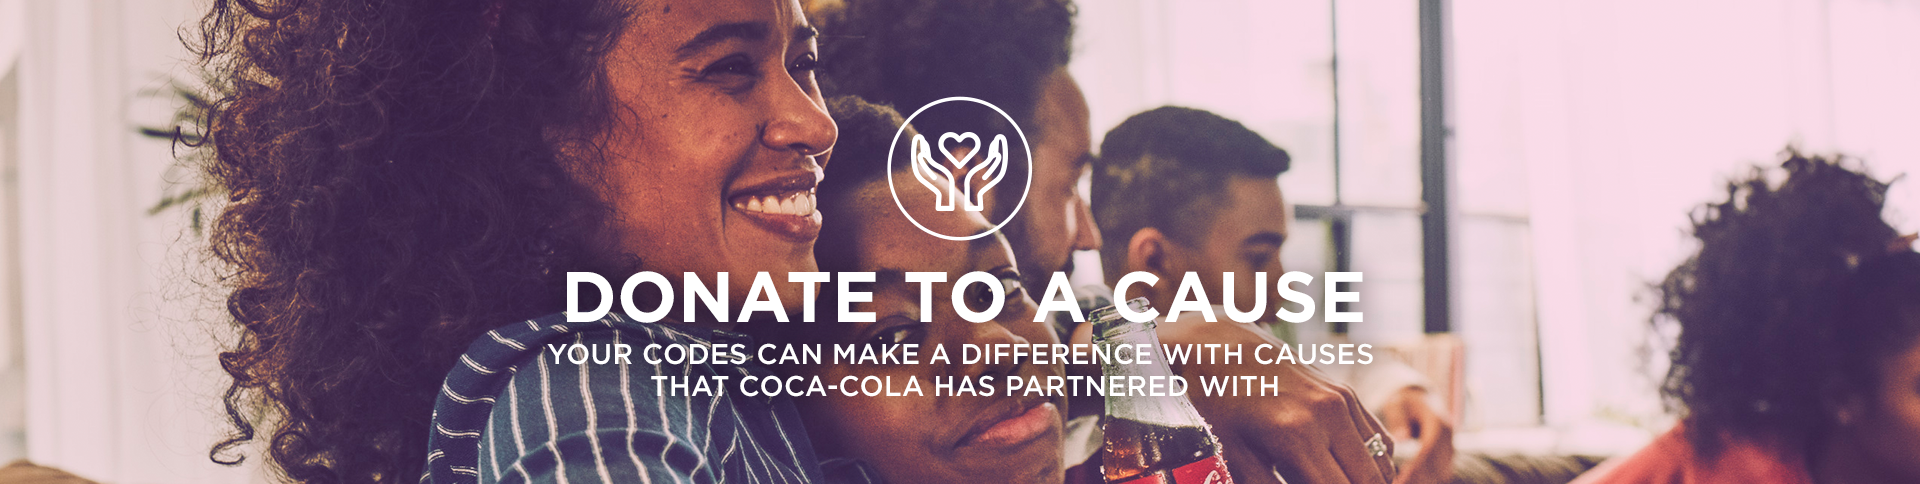 coca-cola give